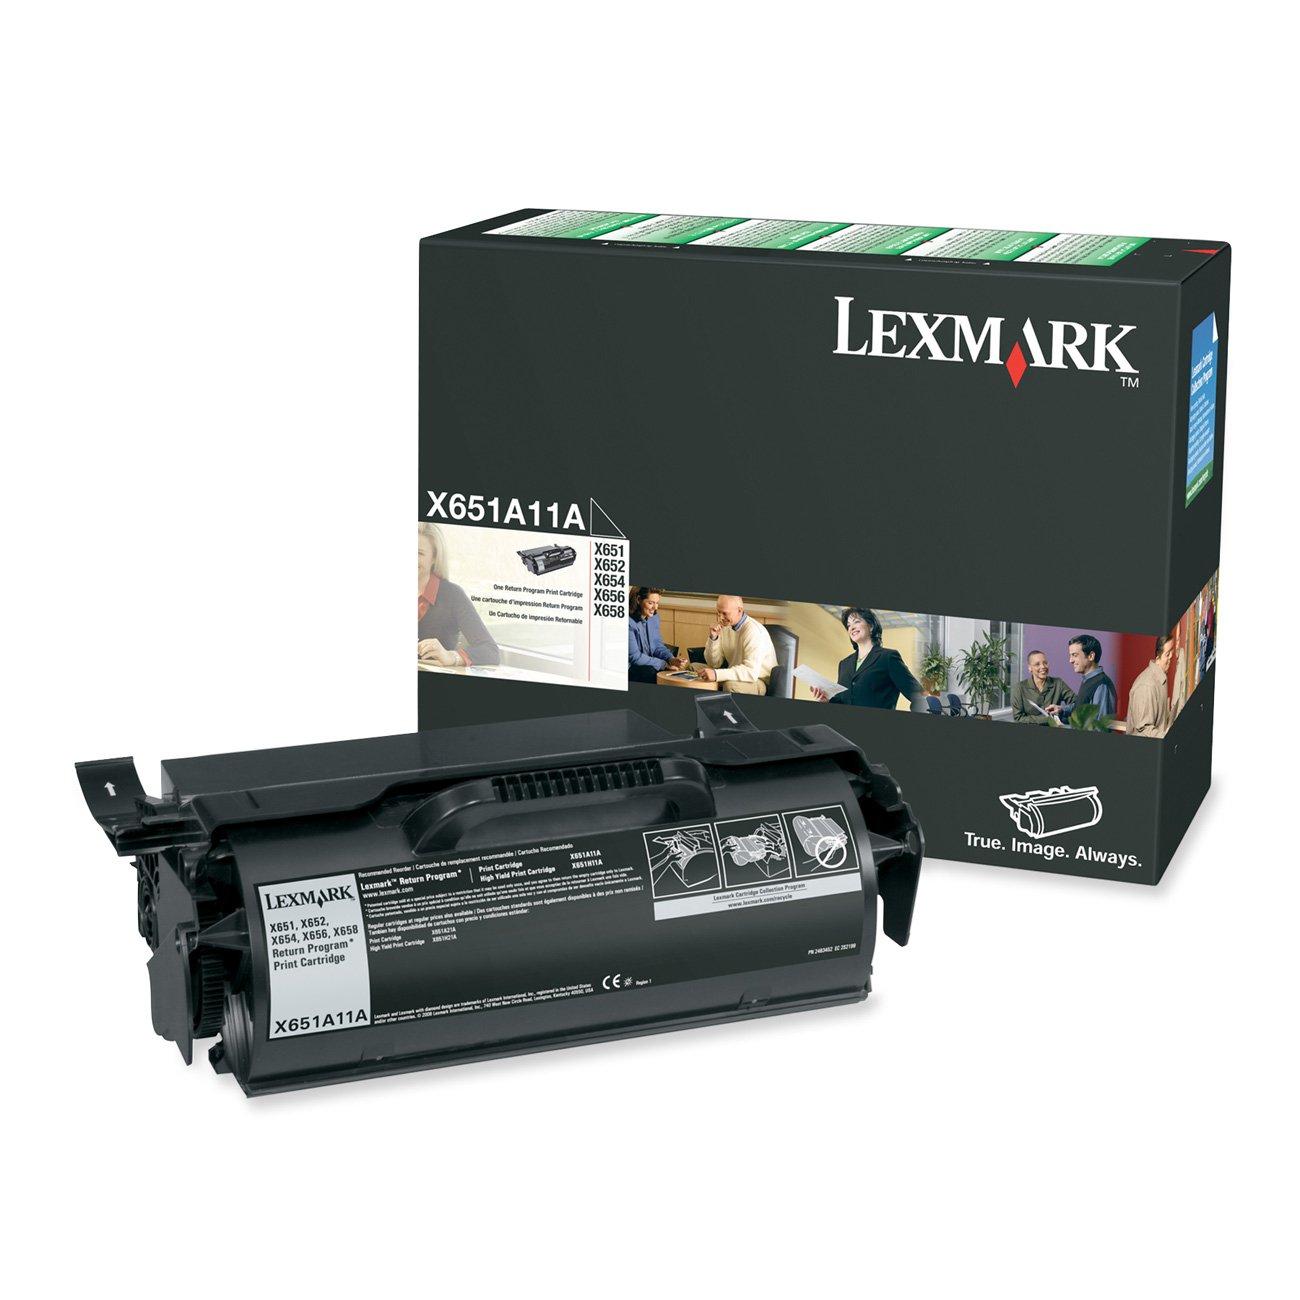 Lexmark X651A11A Toner Cartridge 7000 Page-Yield Black